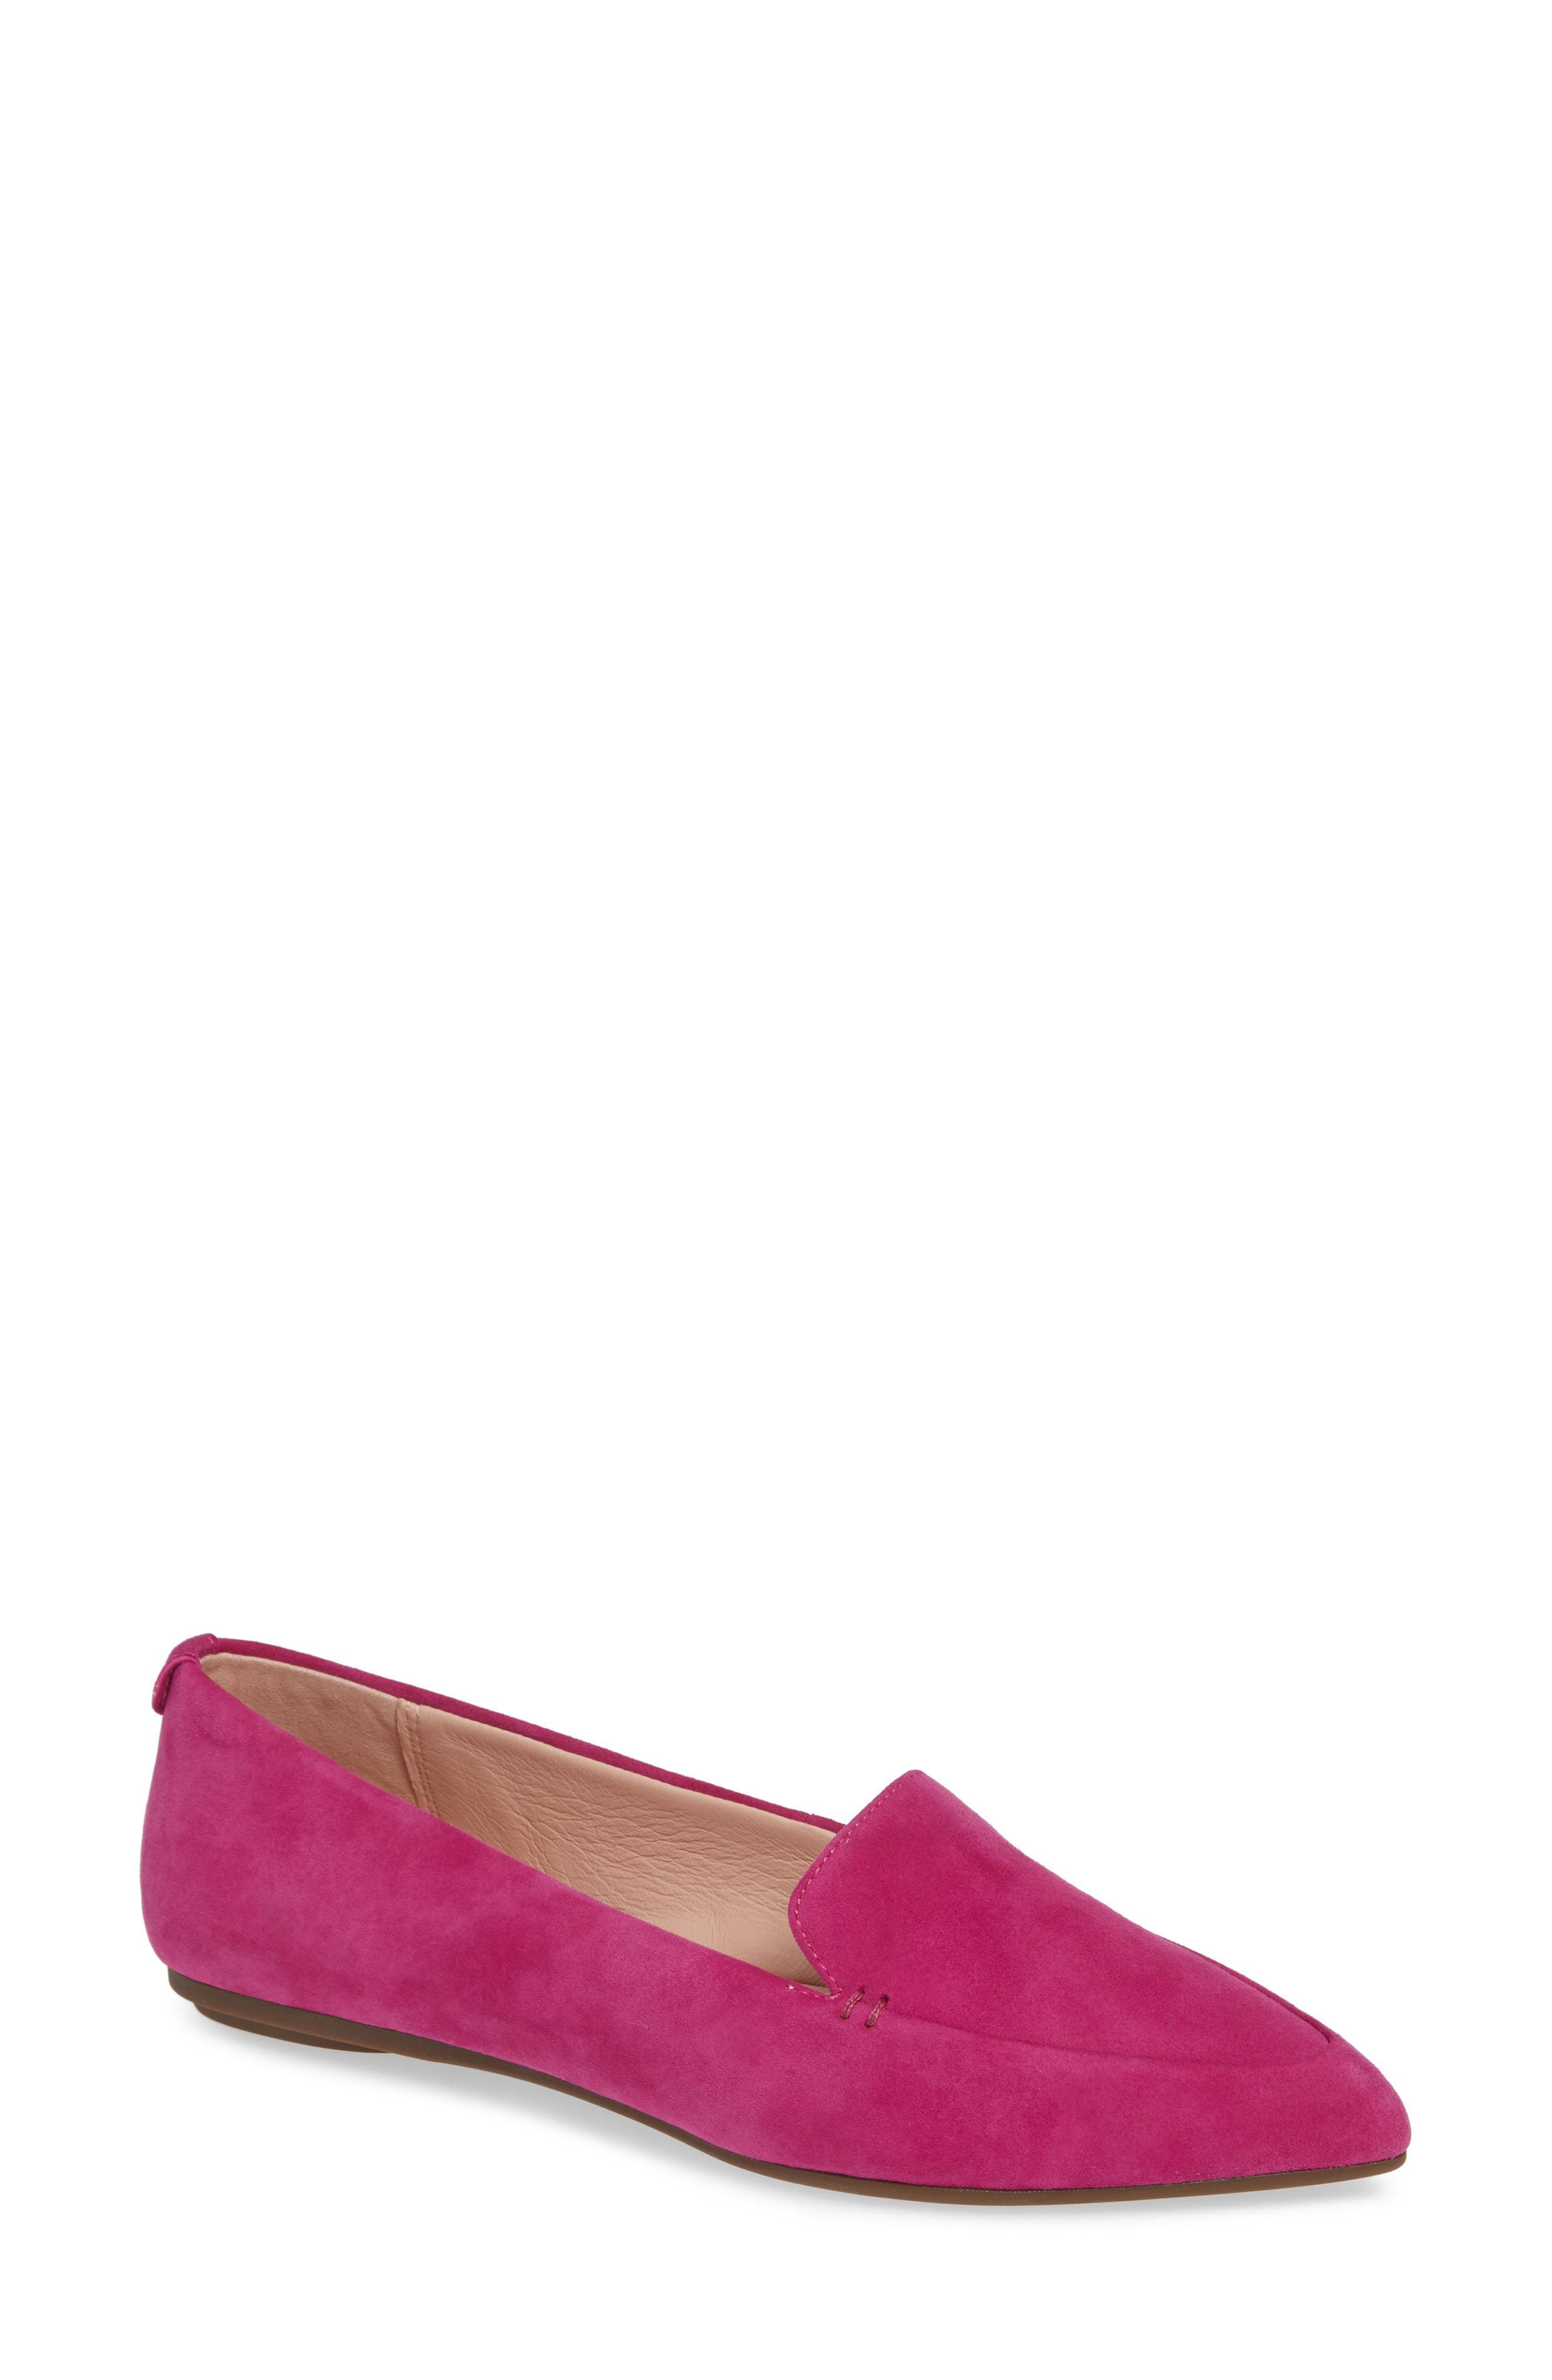 b284a186e8d Lyst - Taryn Rose Faye Pointy Toe Loafer in Pink